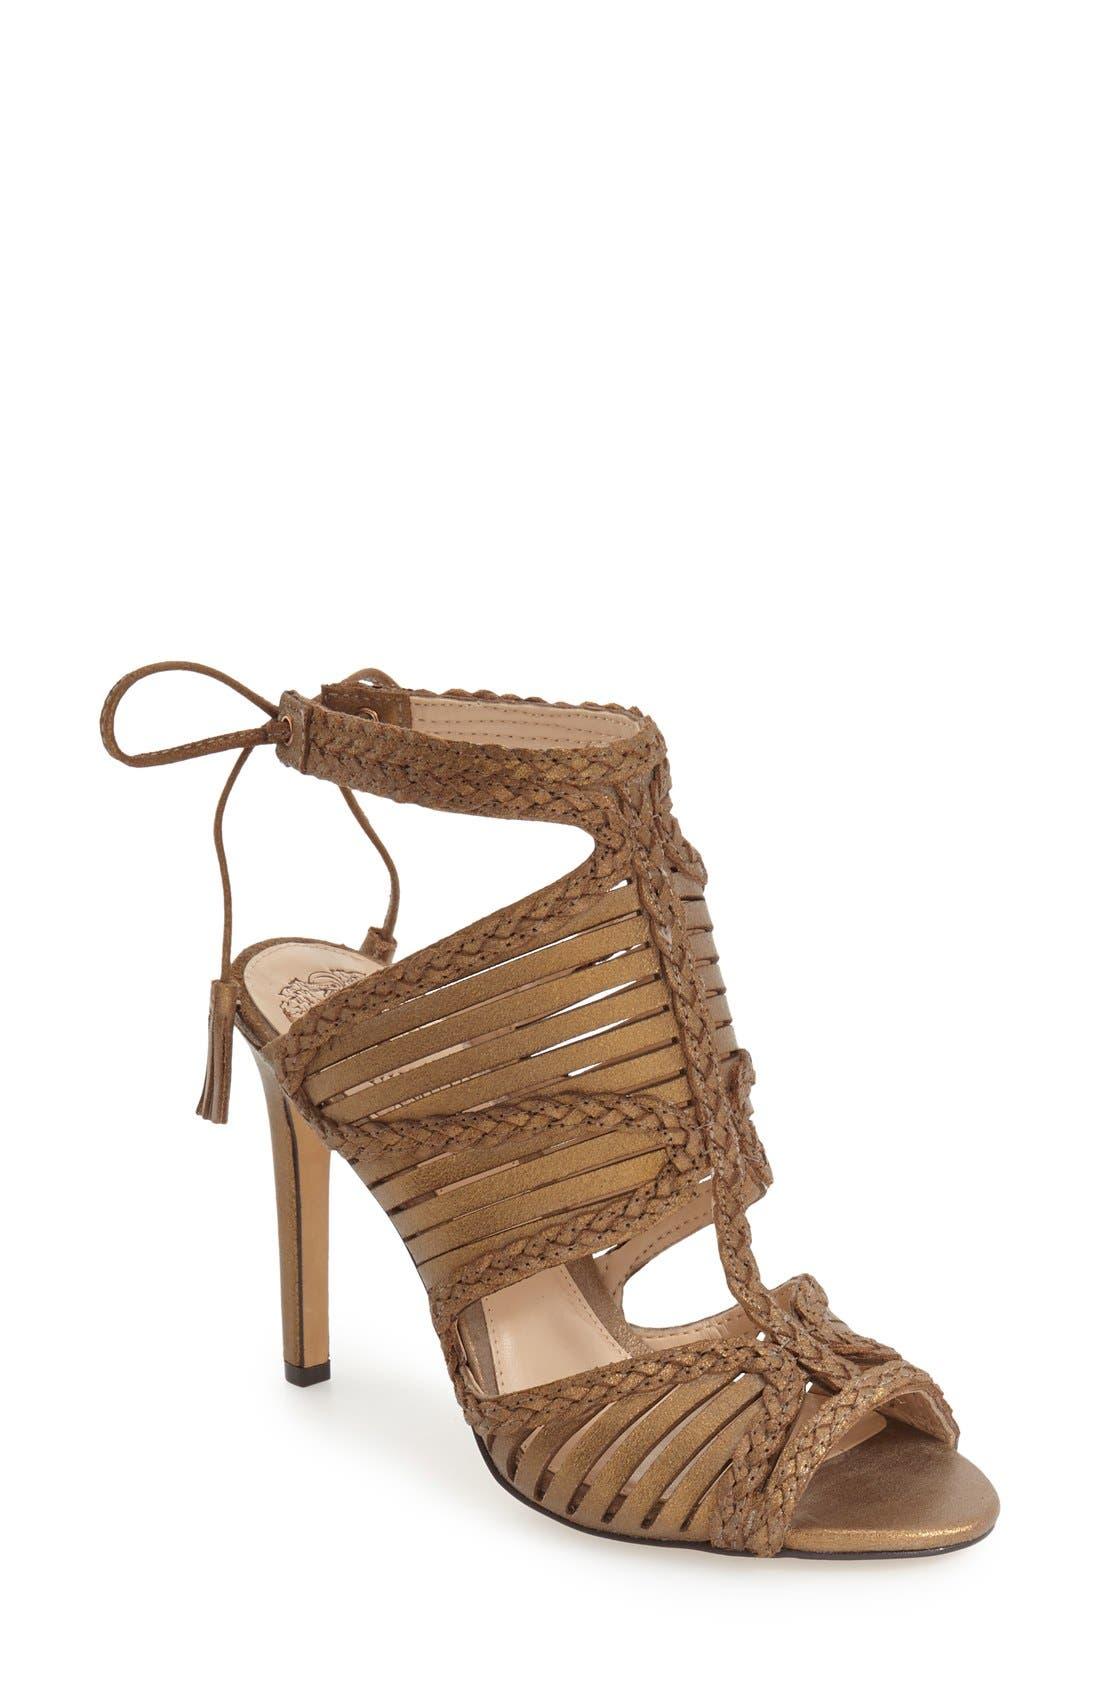 Alternate Image 1 Selected - Vince Camuto 'Kabira' Strappy Sandal (Women)